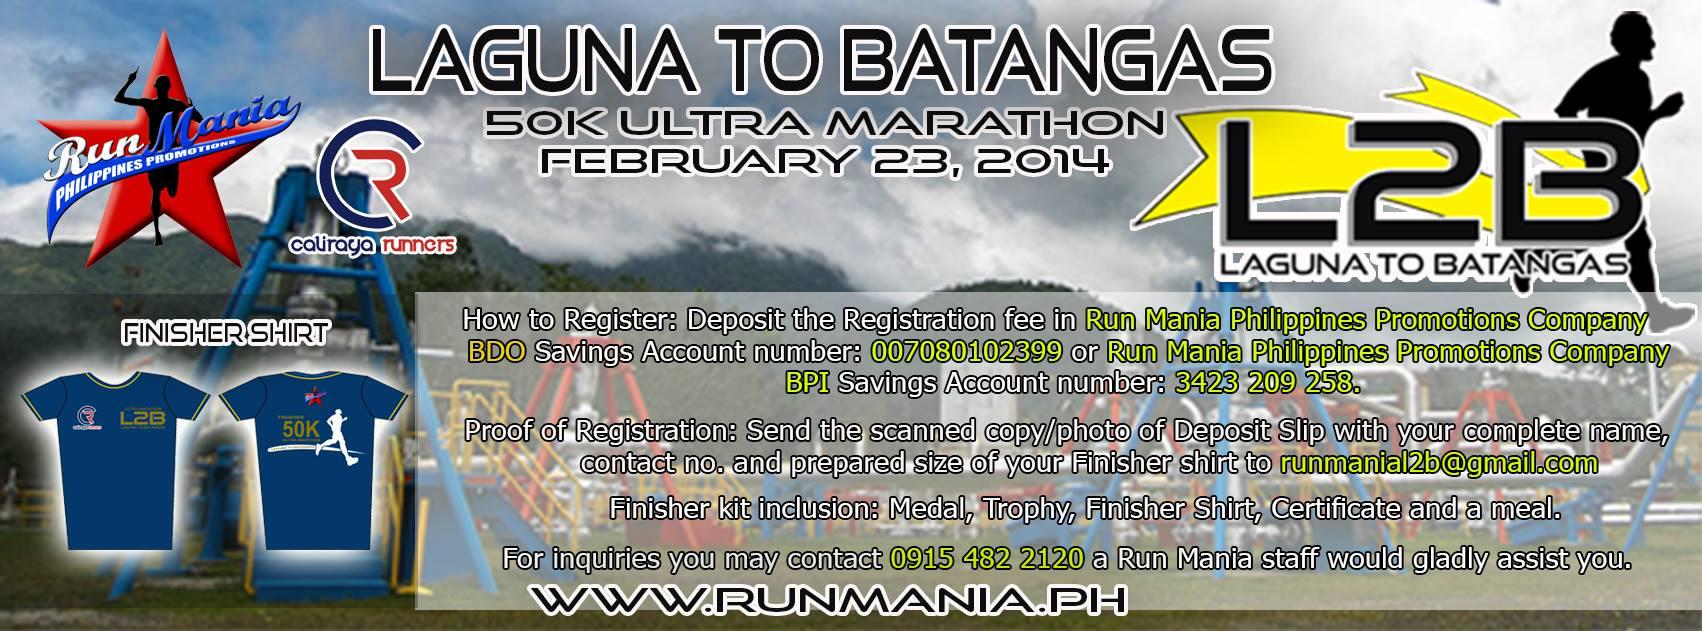 laguna-to-batangas-50k-ultra-marathon-2014-poster